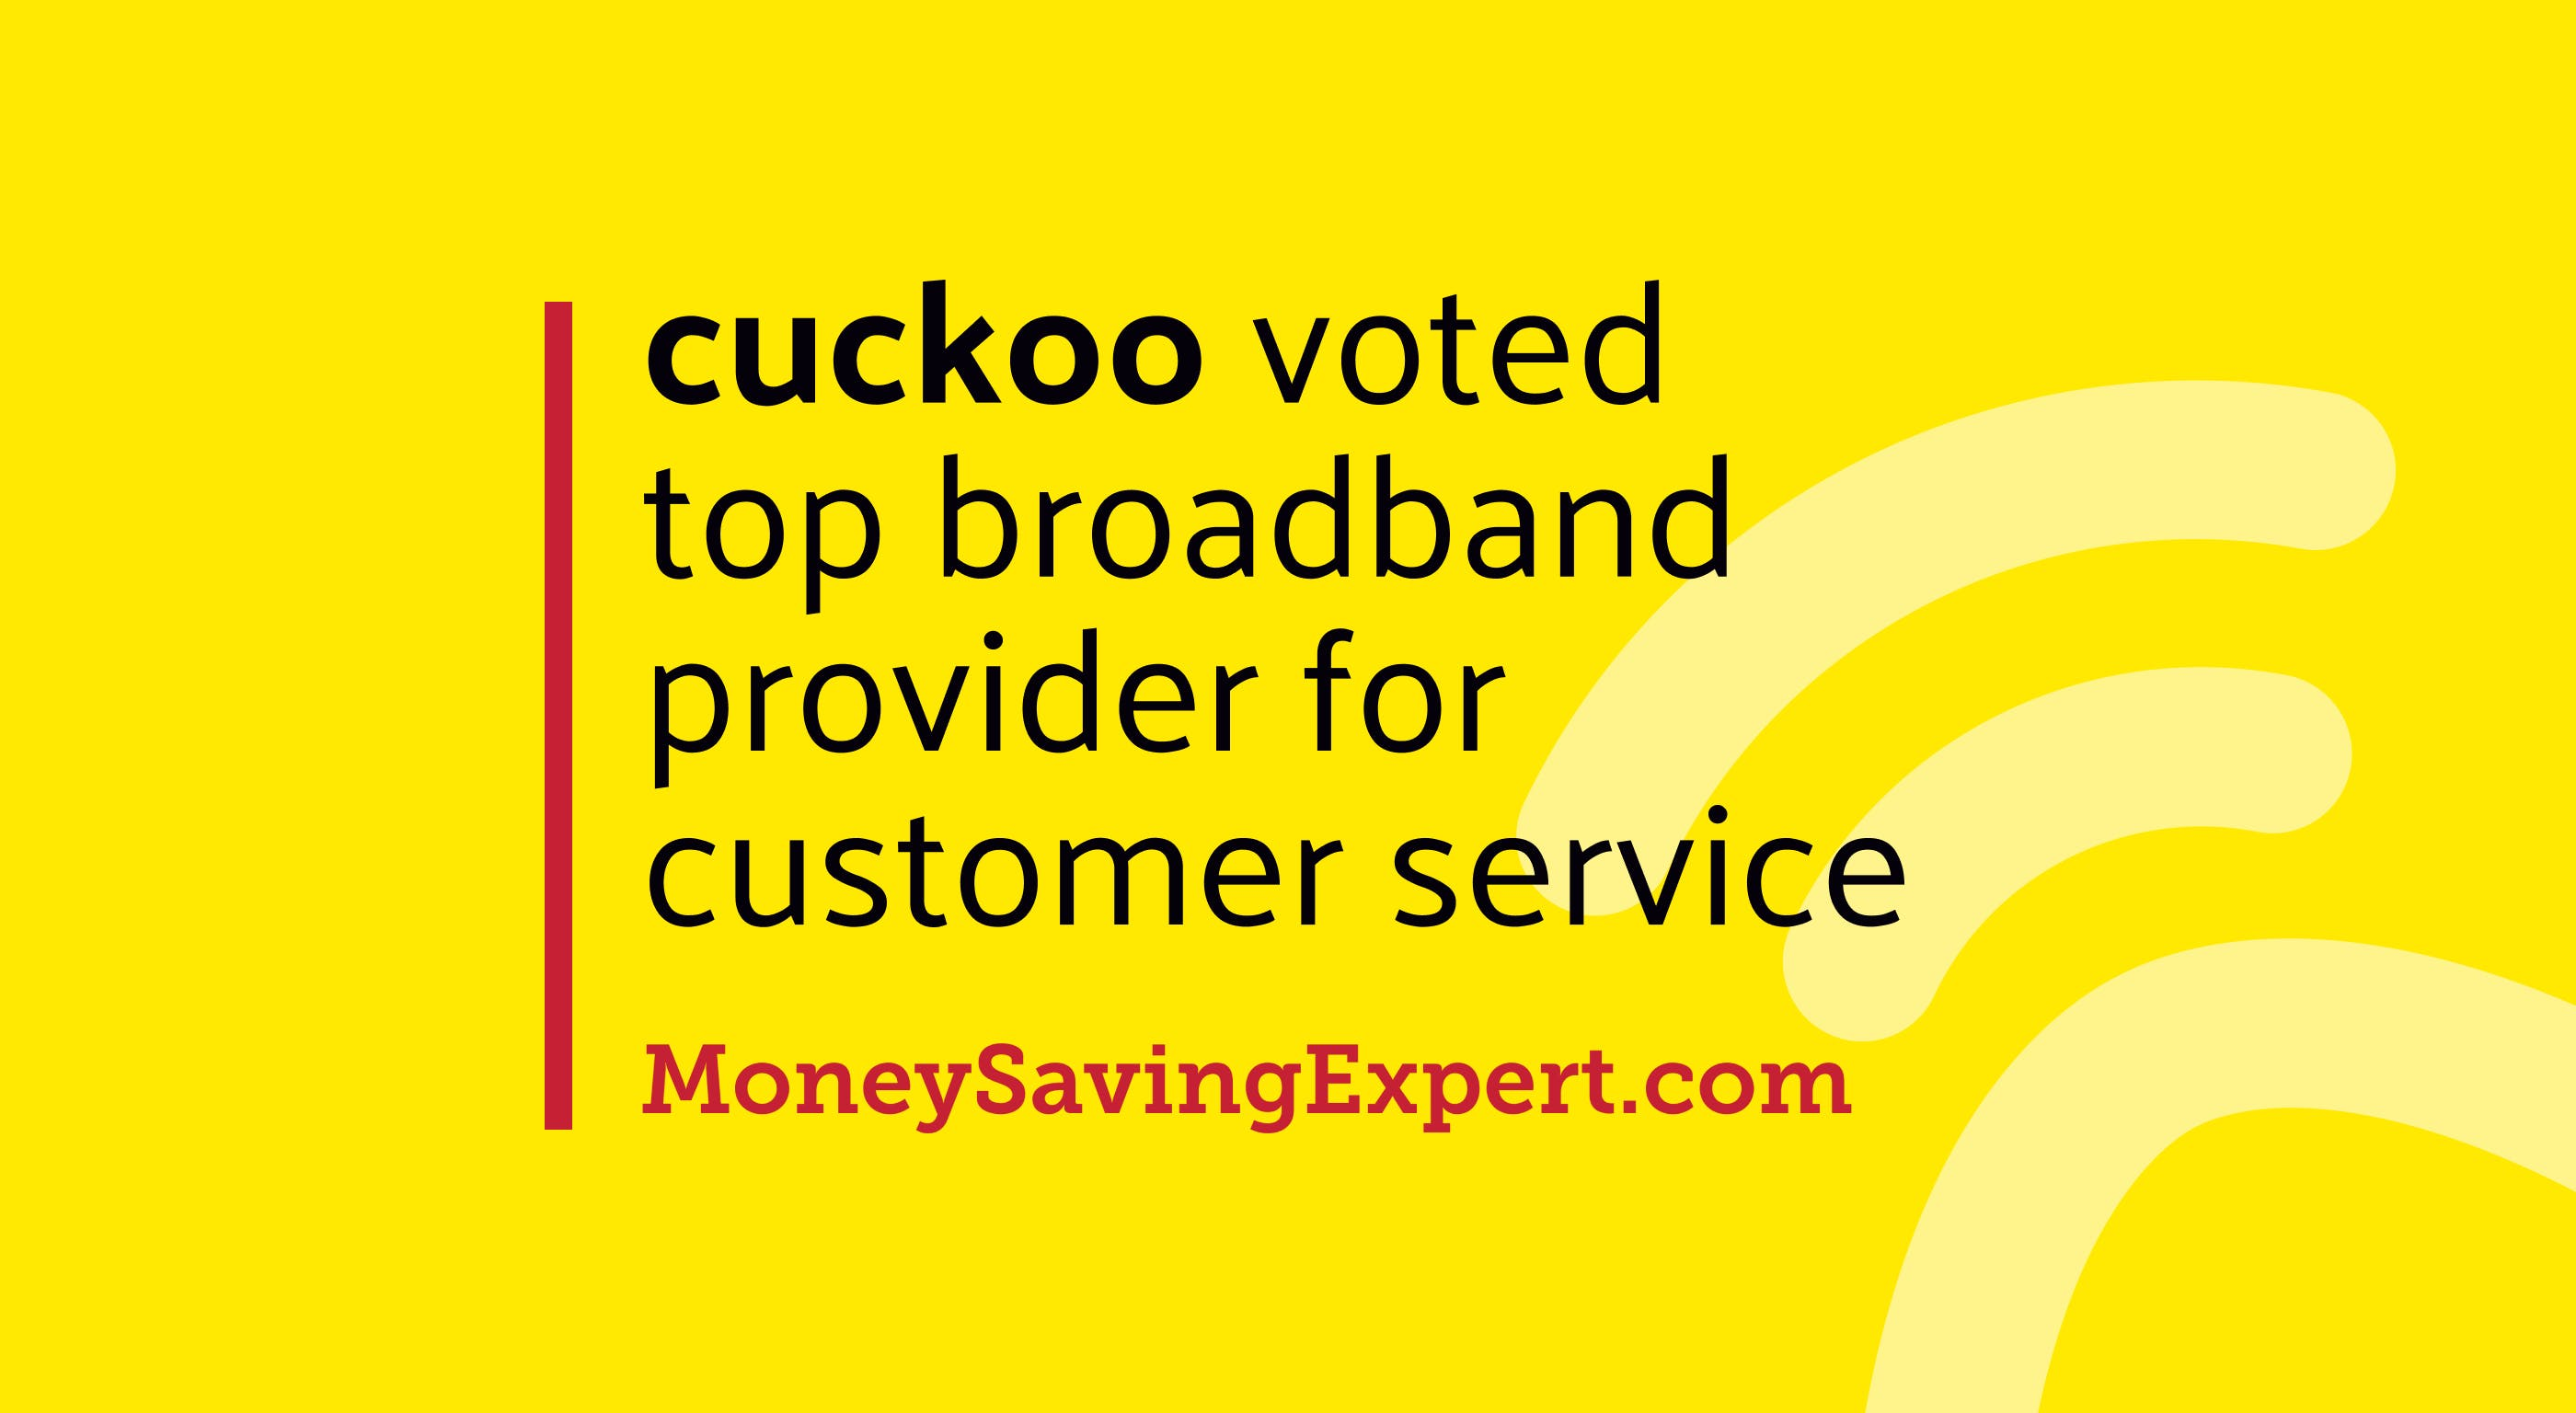 Cuckoo voted top broadband provider for customer service